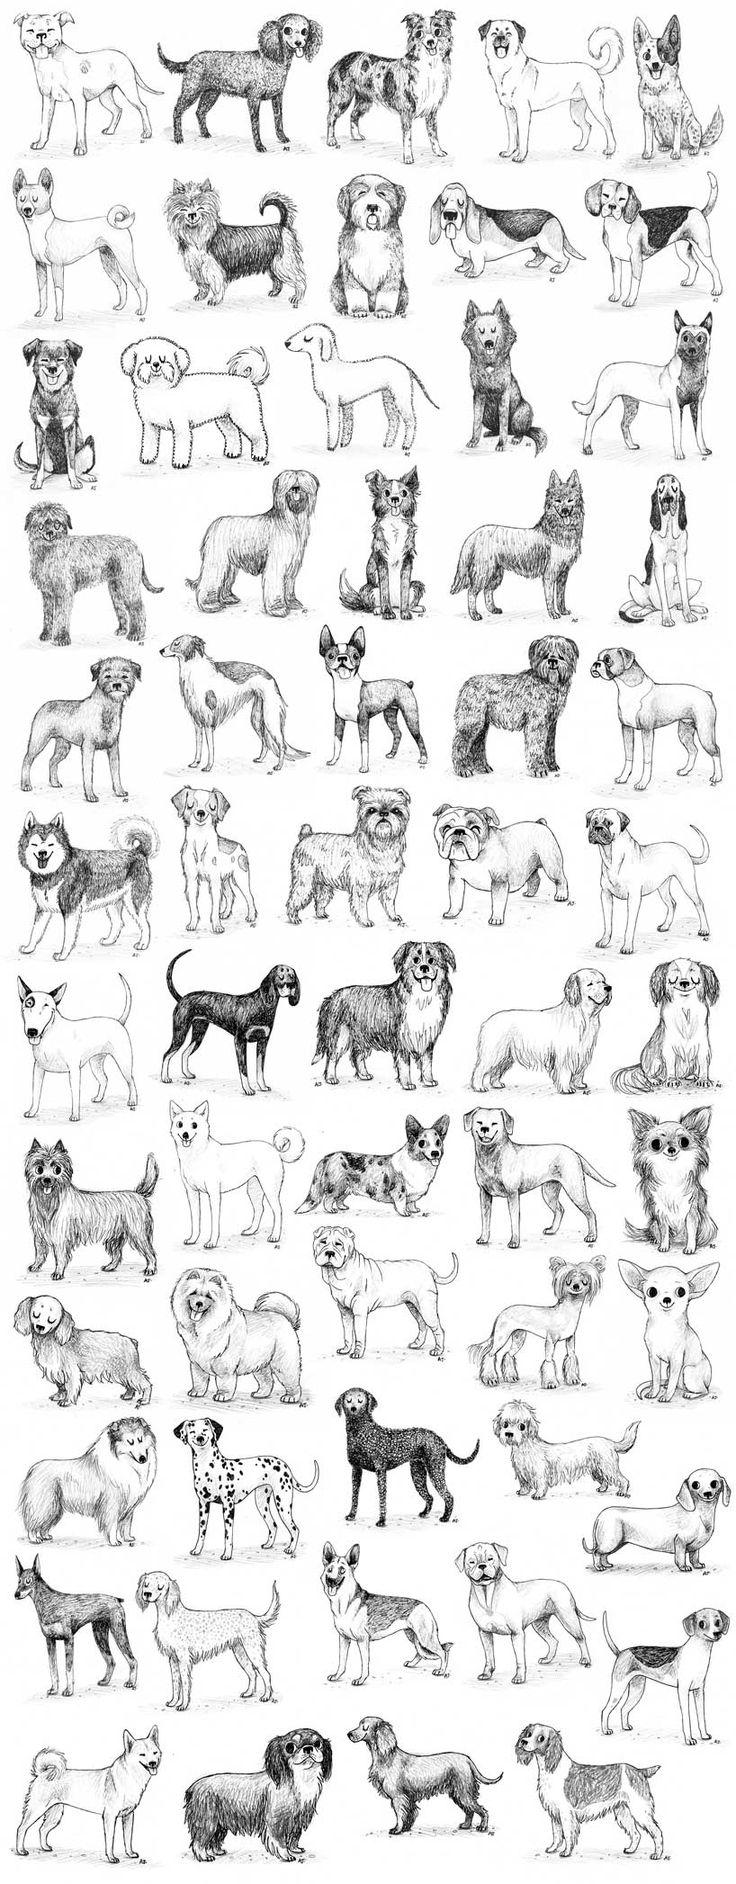 dogs dogs dogs by ~aj00 on deviantART